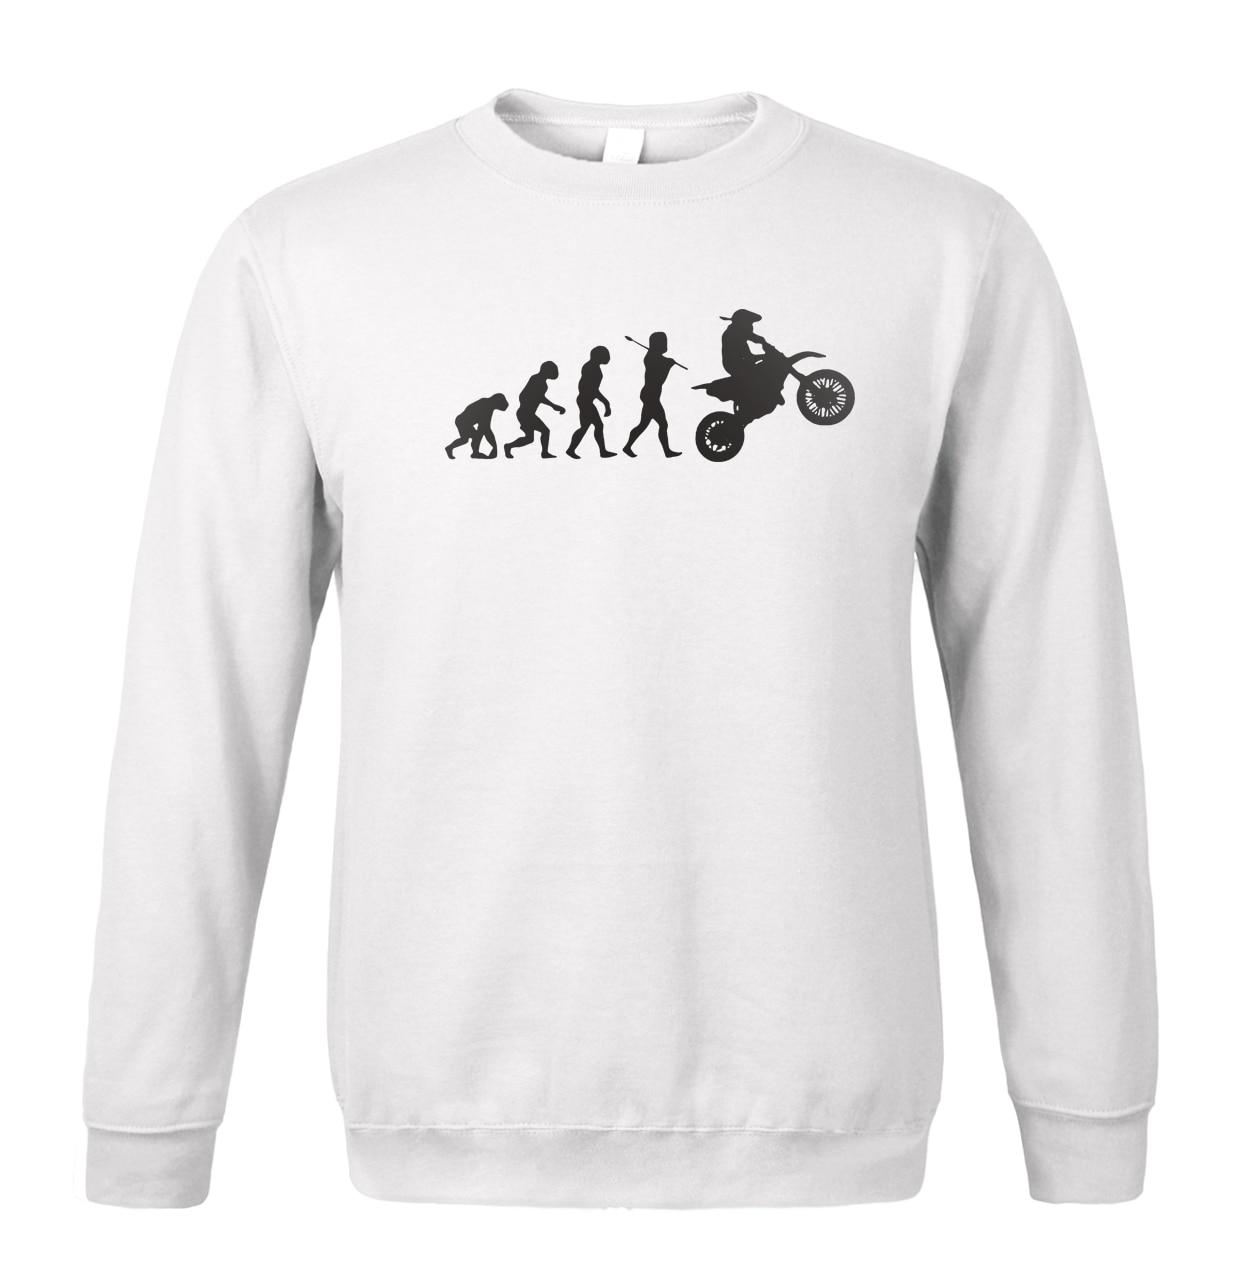 2019 spring winter fleece sweatshirts Evolution Motocross Sweatshirt Dirtbike hoody car-styling men's sportswear brand-clothing